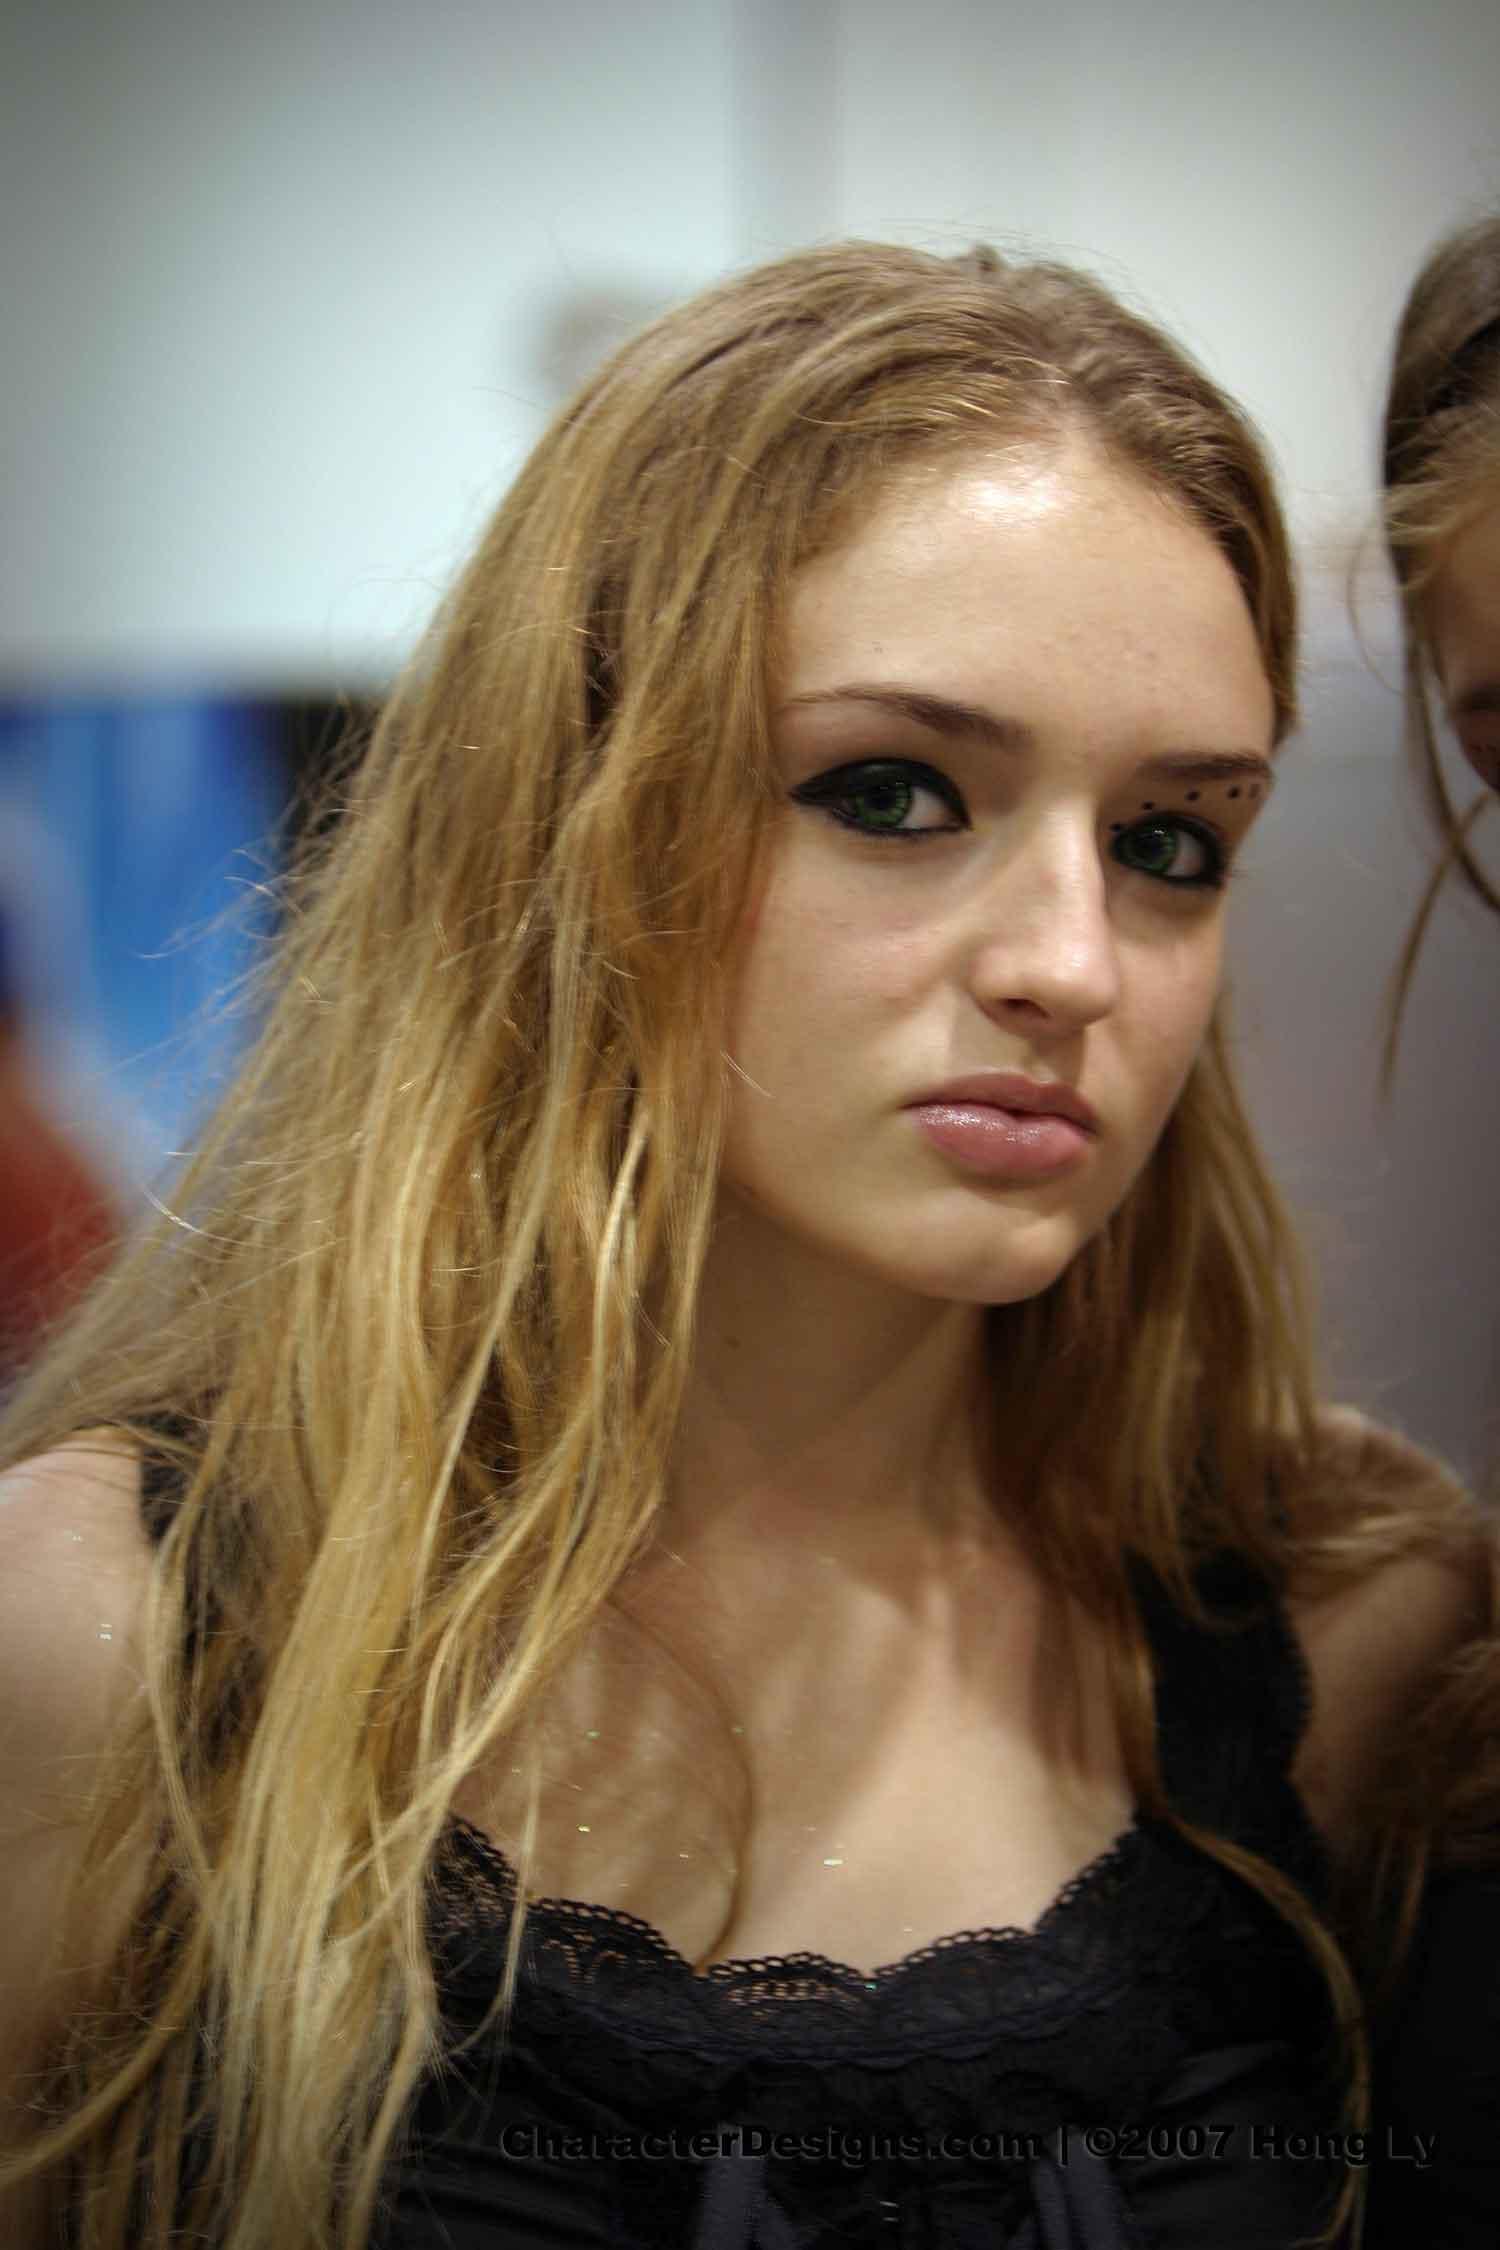 Faces_of_AX_2006_290.jpg